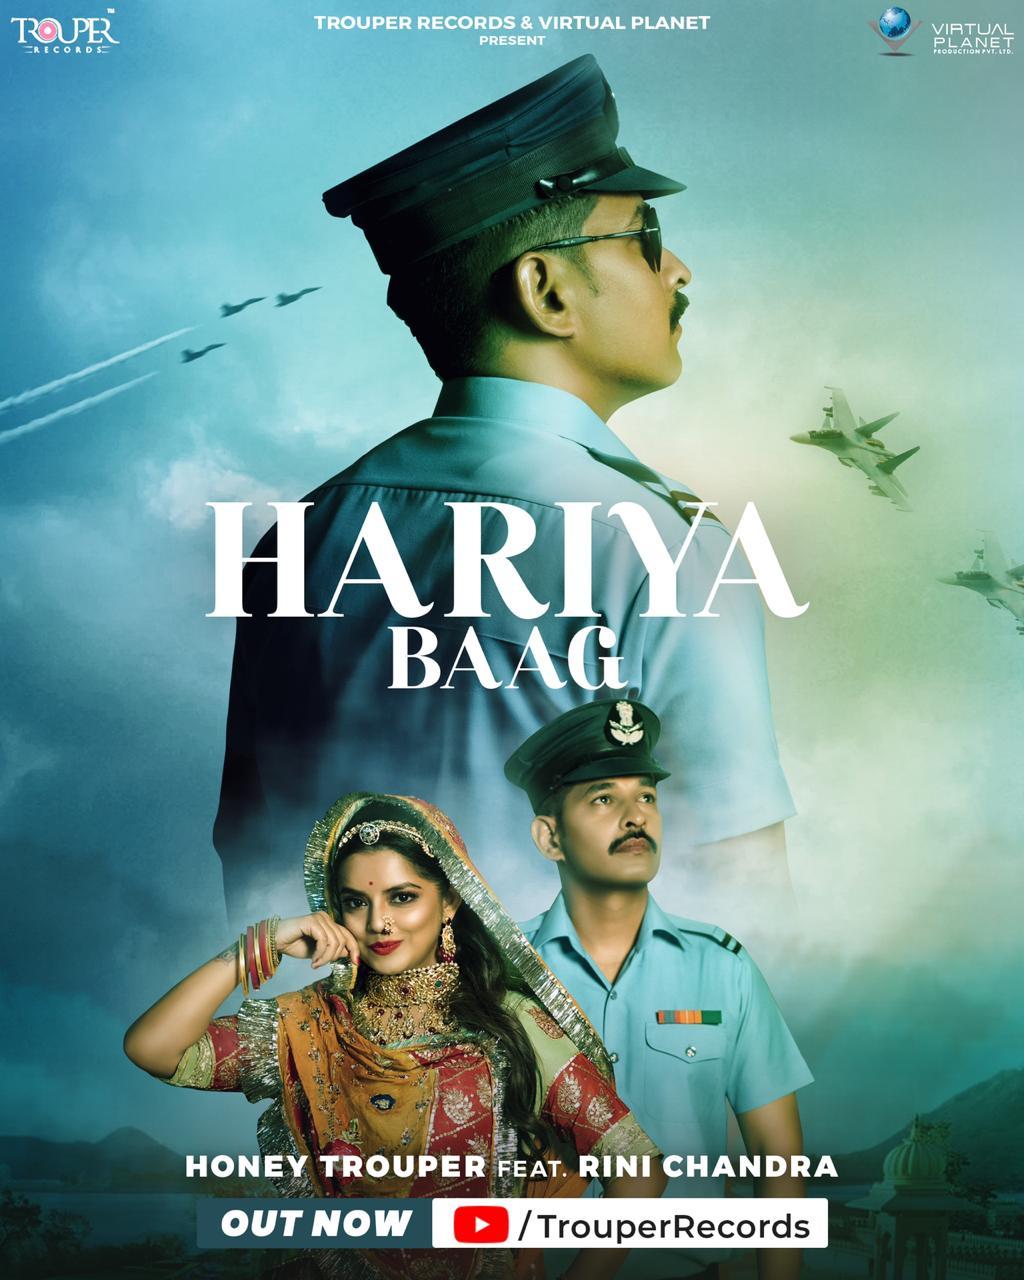 Actor-Honey-Sharma-and-singer-Rini-Chandra-starring-Rajasthani-Song-Hariya-Bagh-in-top-trending